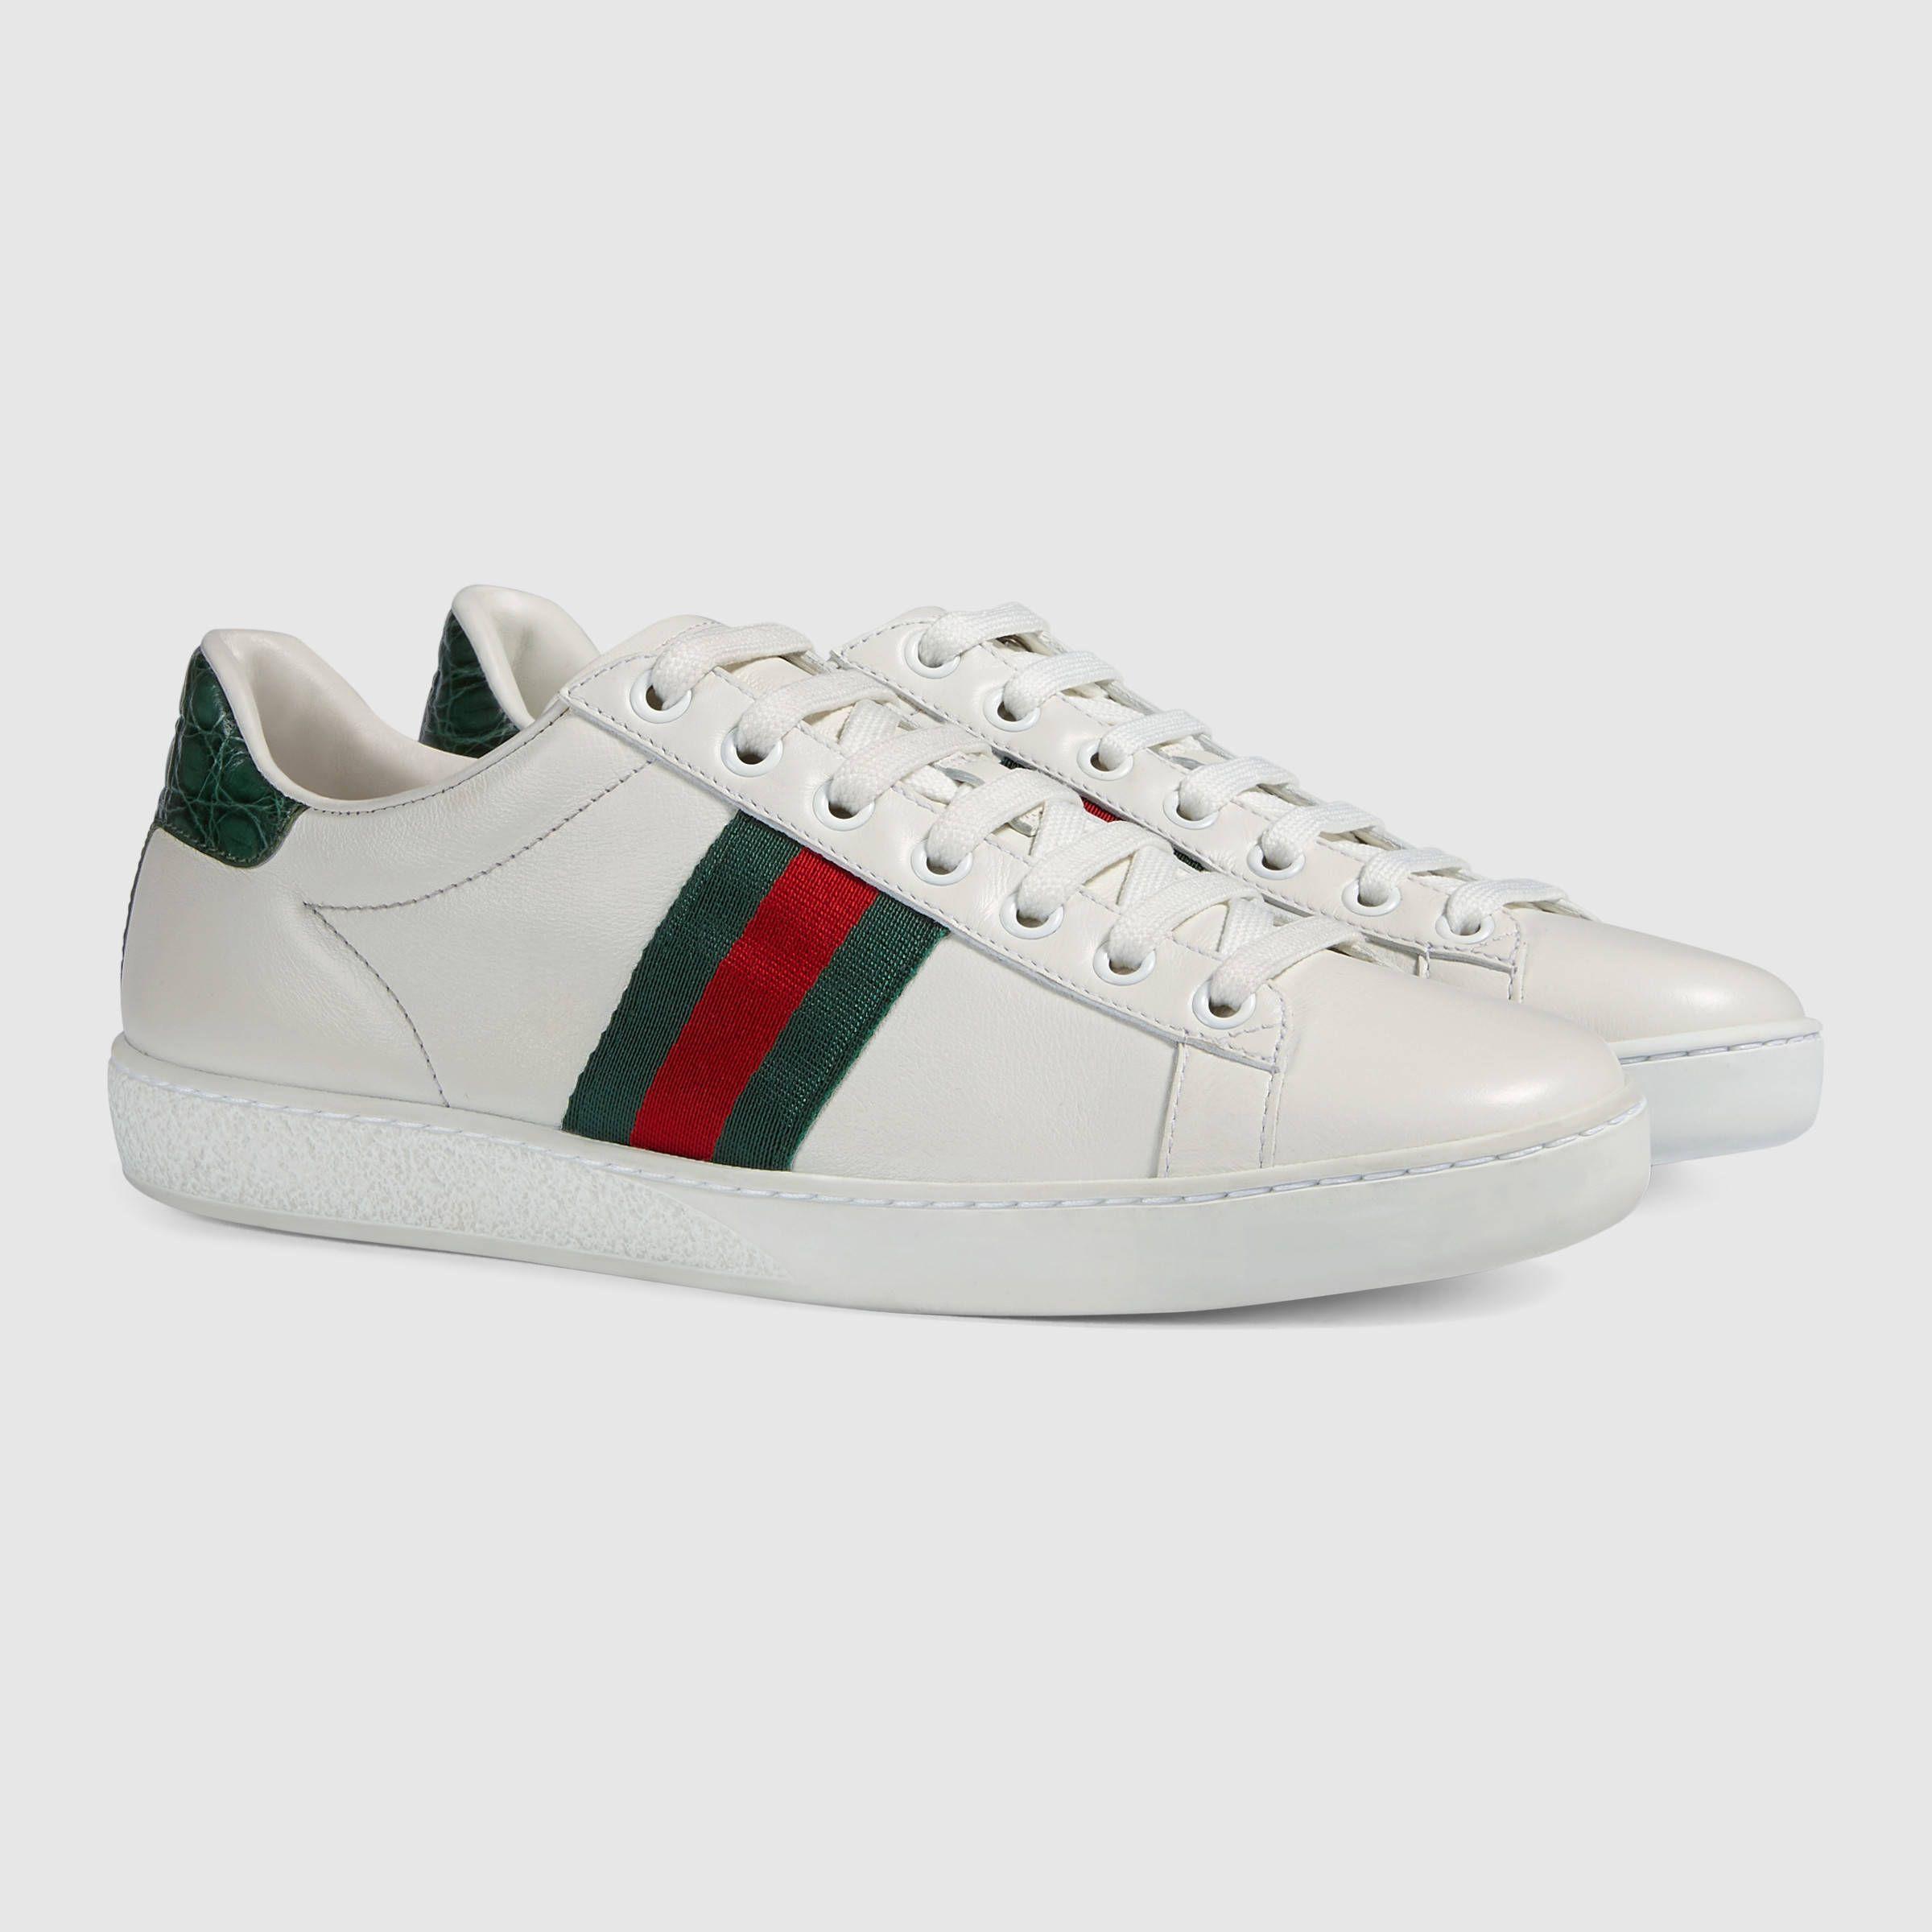 Gucci Baskets en cuir Ace Detail 2 Chaussure, Chaussures Crocs, Chaussure  Gucci, Chaussures da49cf55168